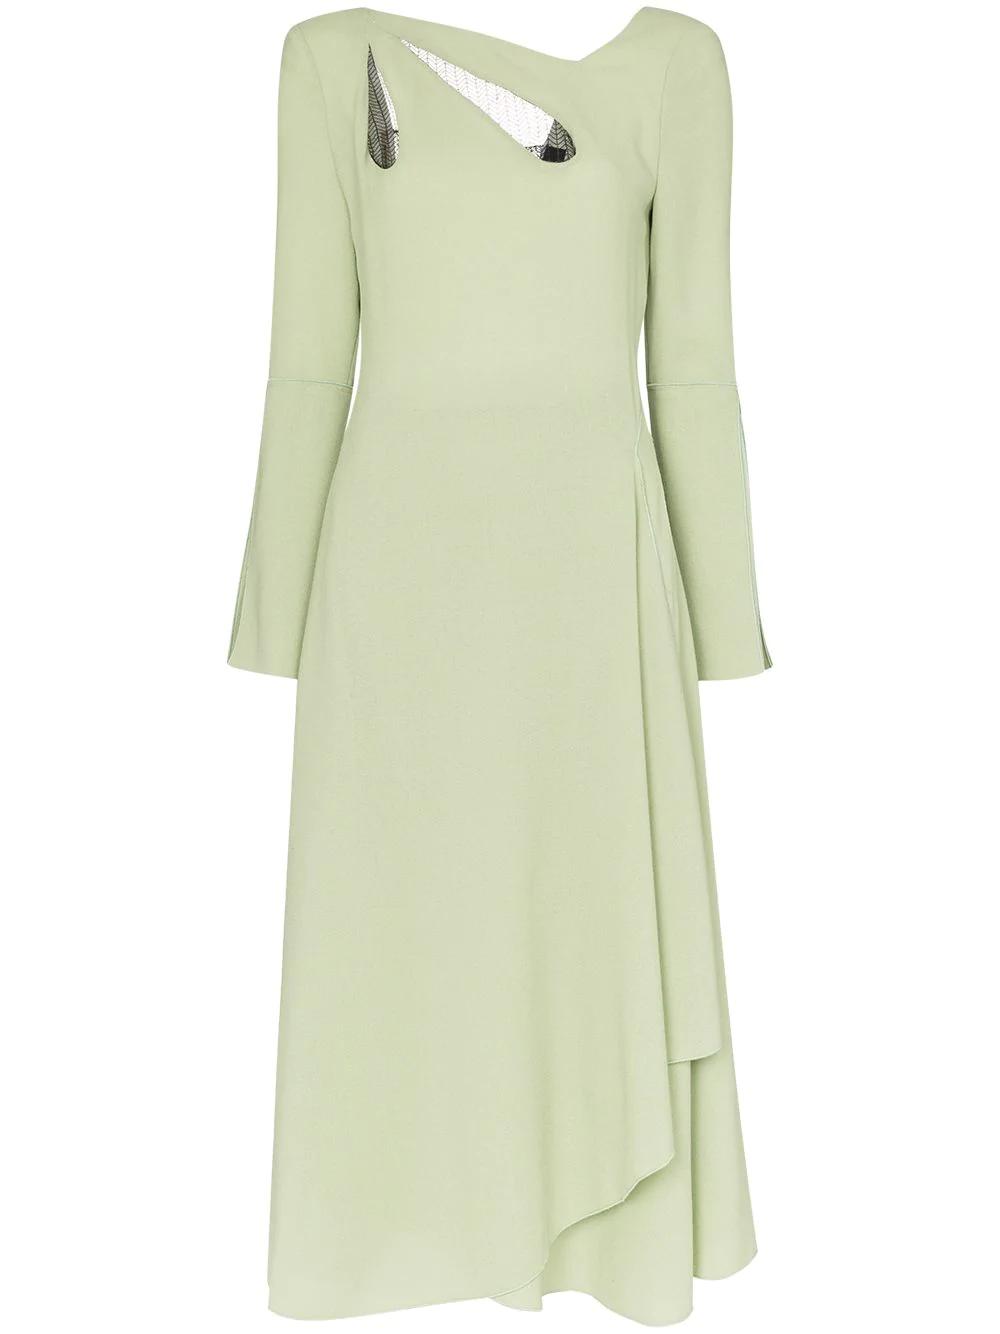 c4ecf8d0a3f Roland Mouret Oreti Cutout Detail Asymmetric Wool Dress - Green ...